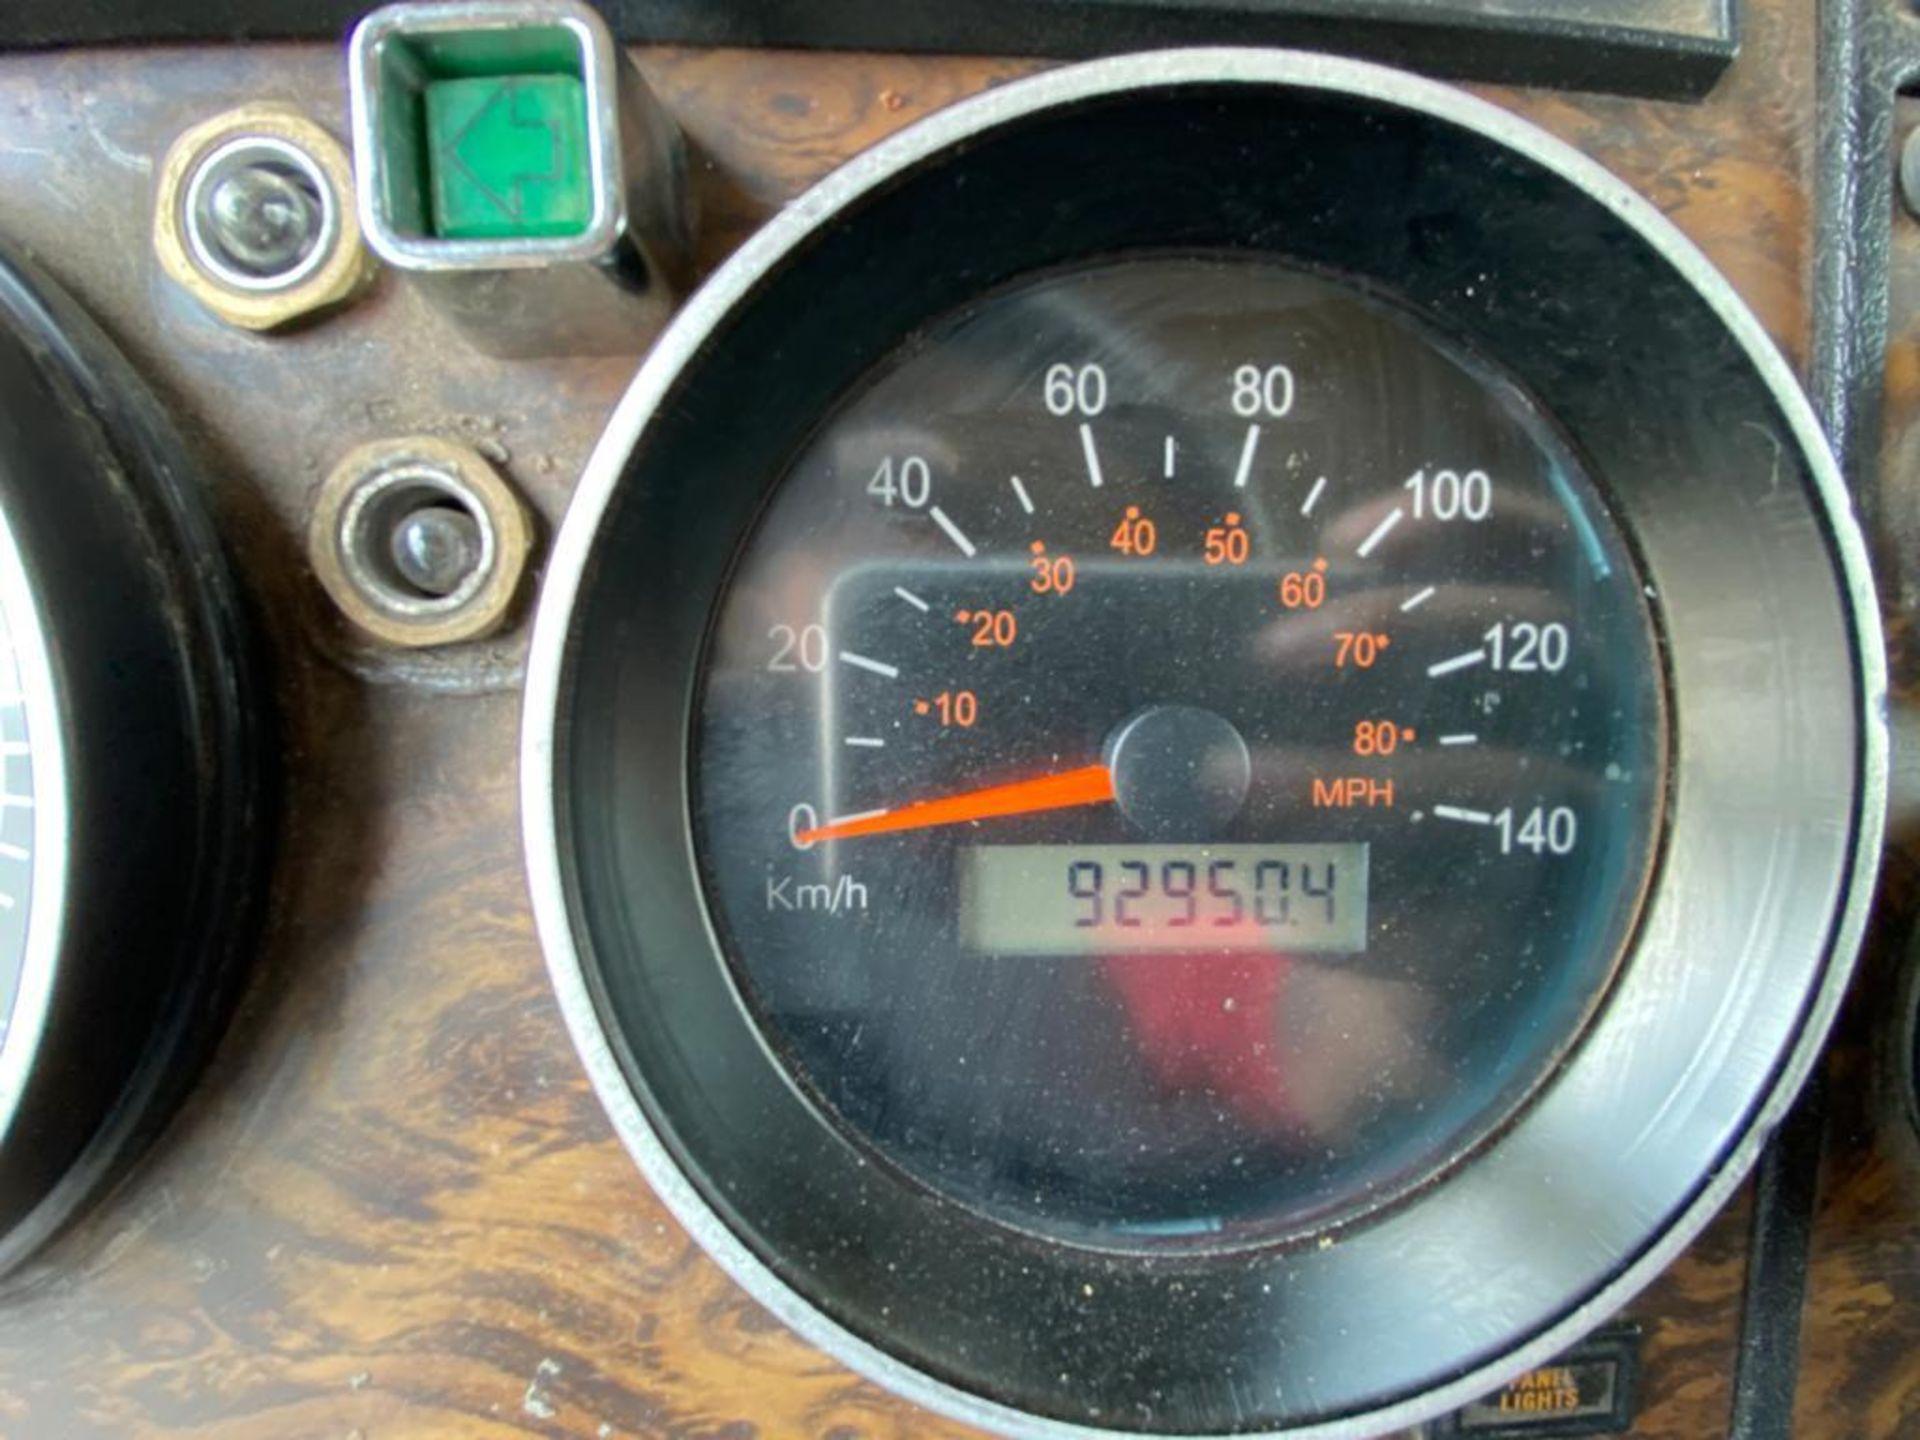 1999 Kenworth Sleeper truck tractor, standard transmission of 18 speeds - Image 38 of 70